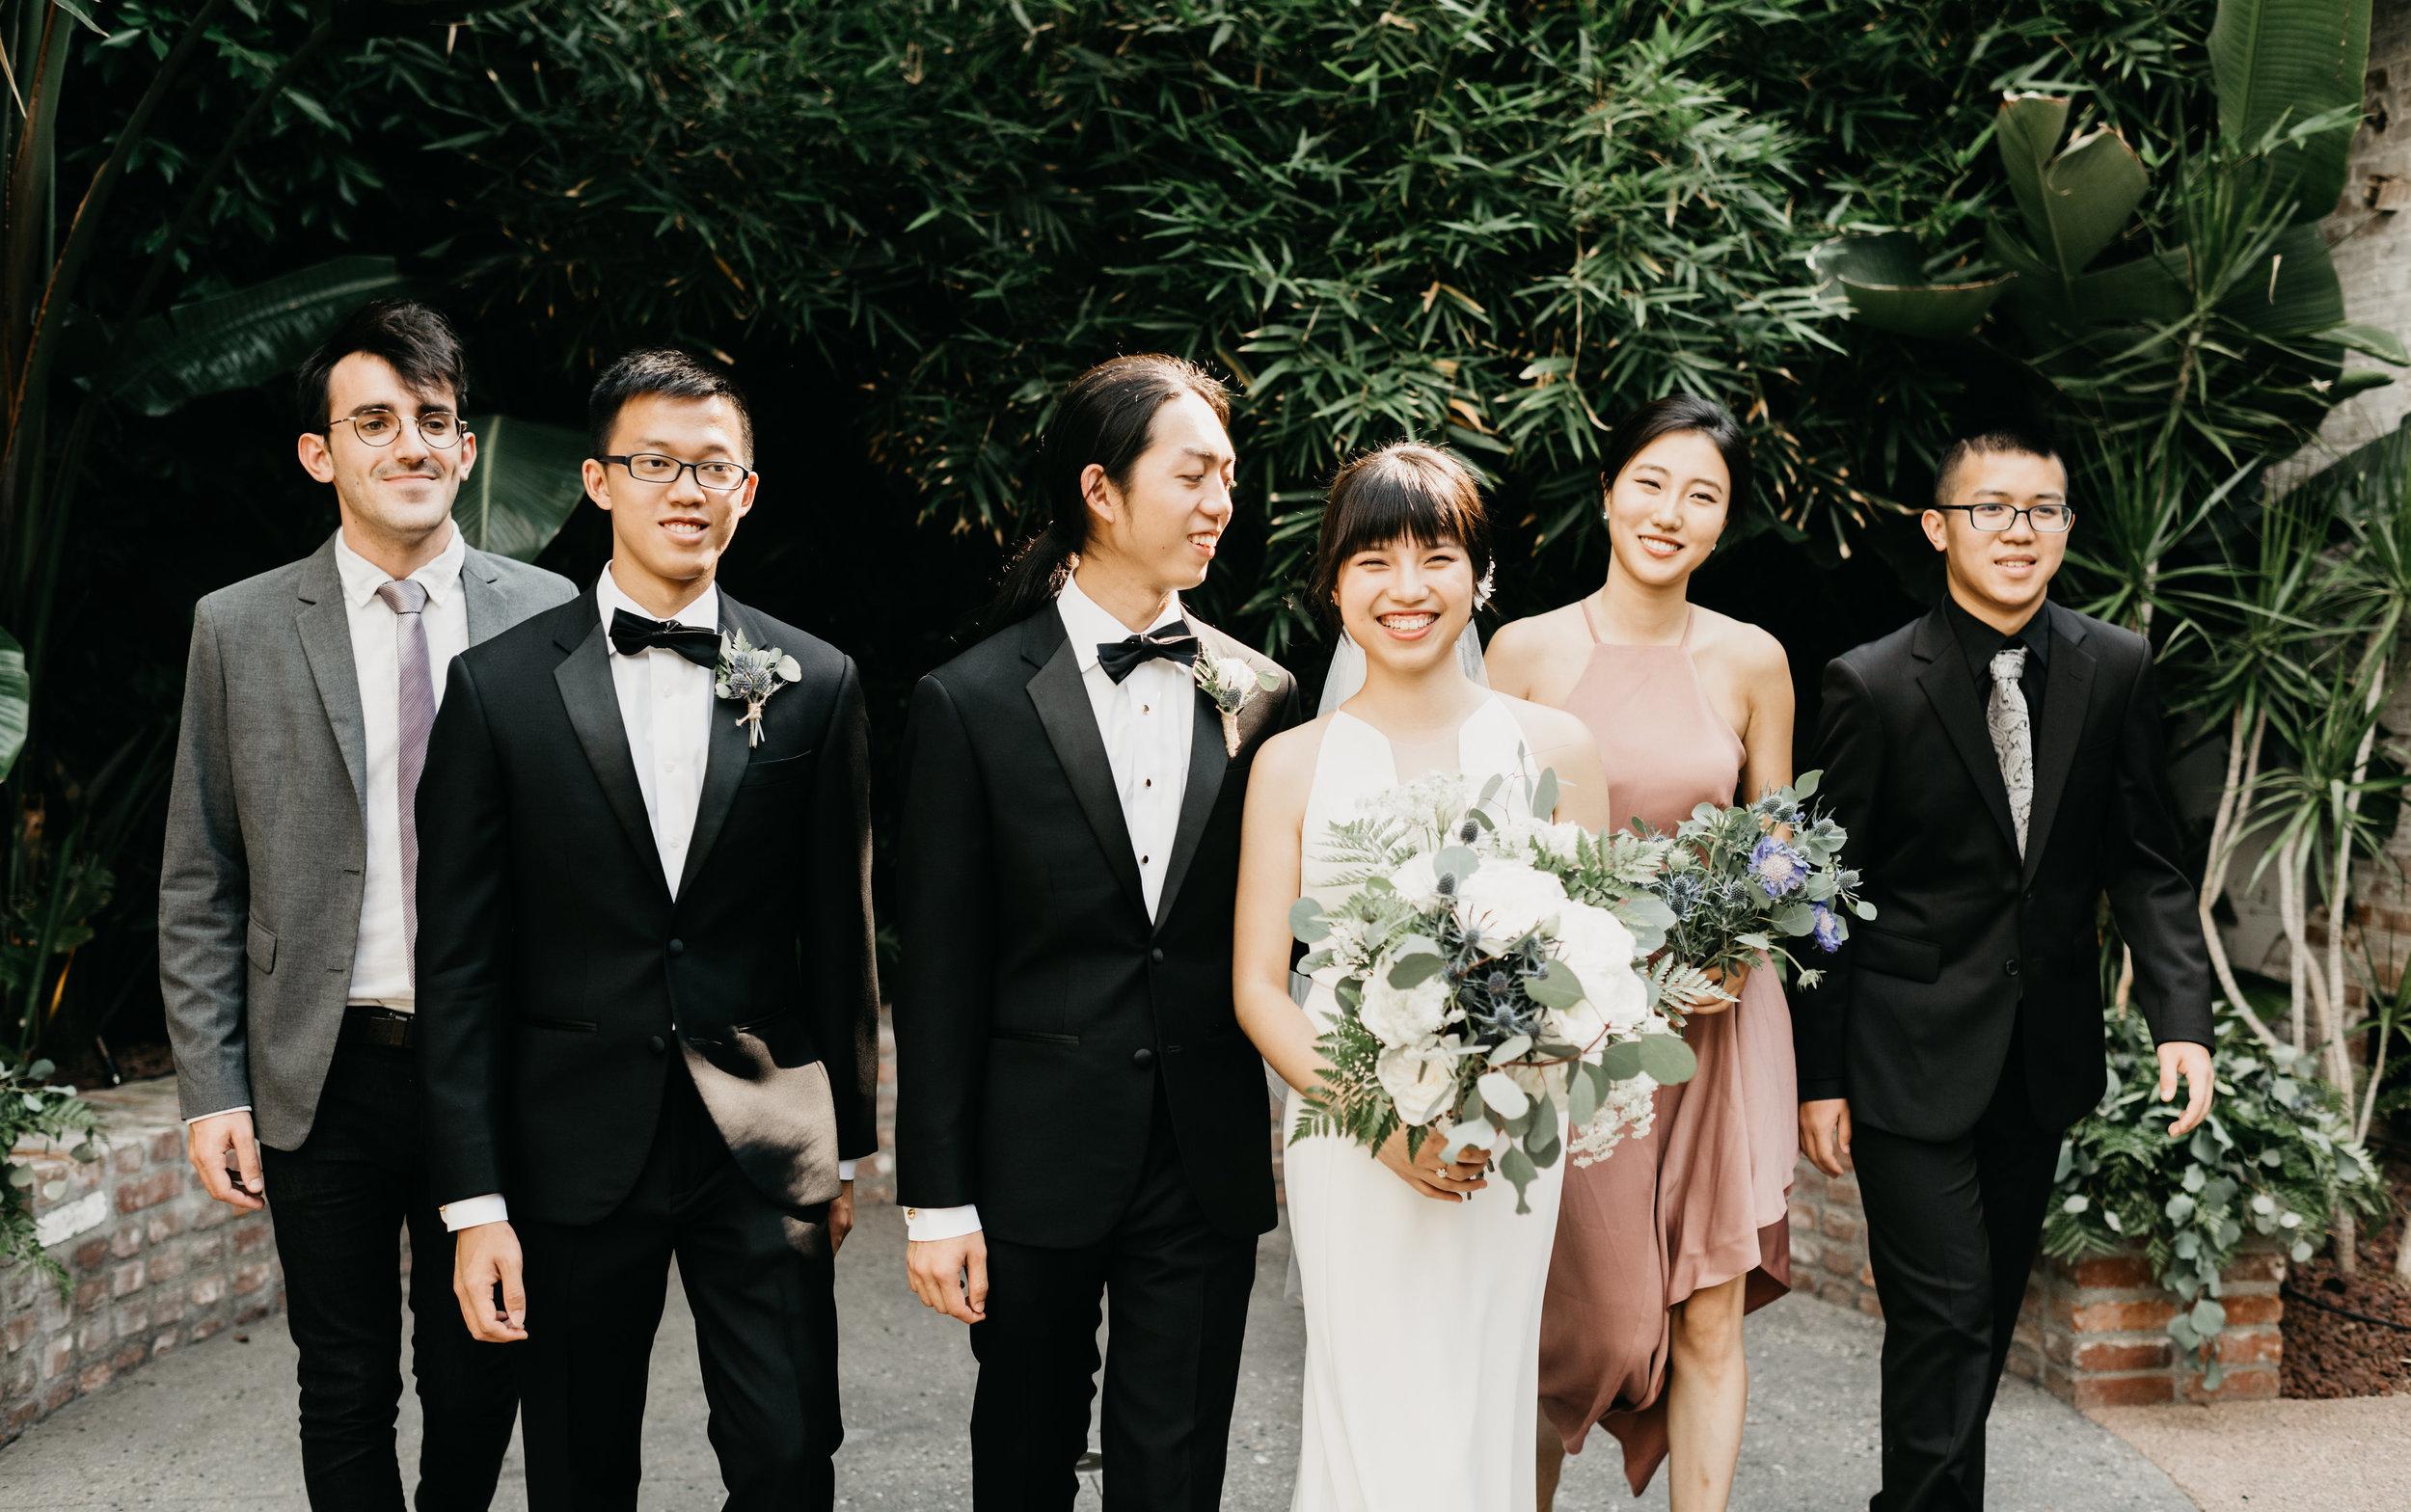 Millwick-wedding-planner52.jpg